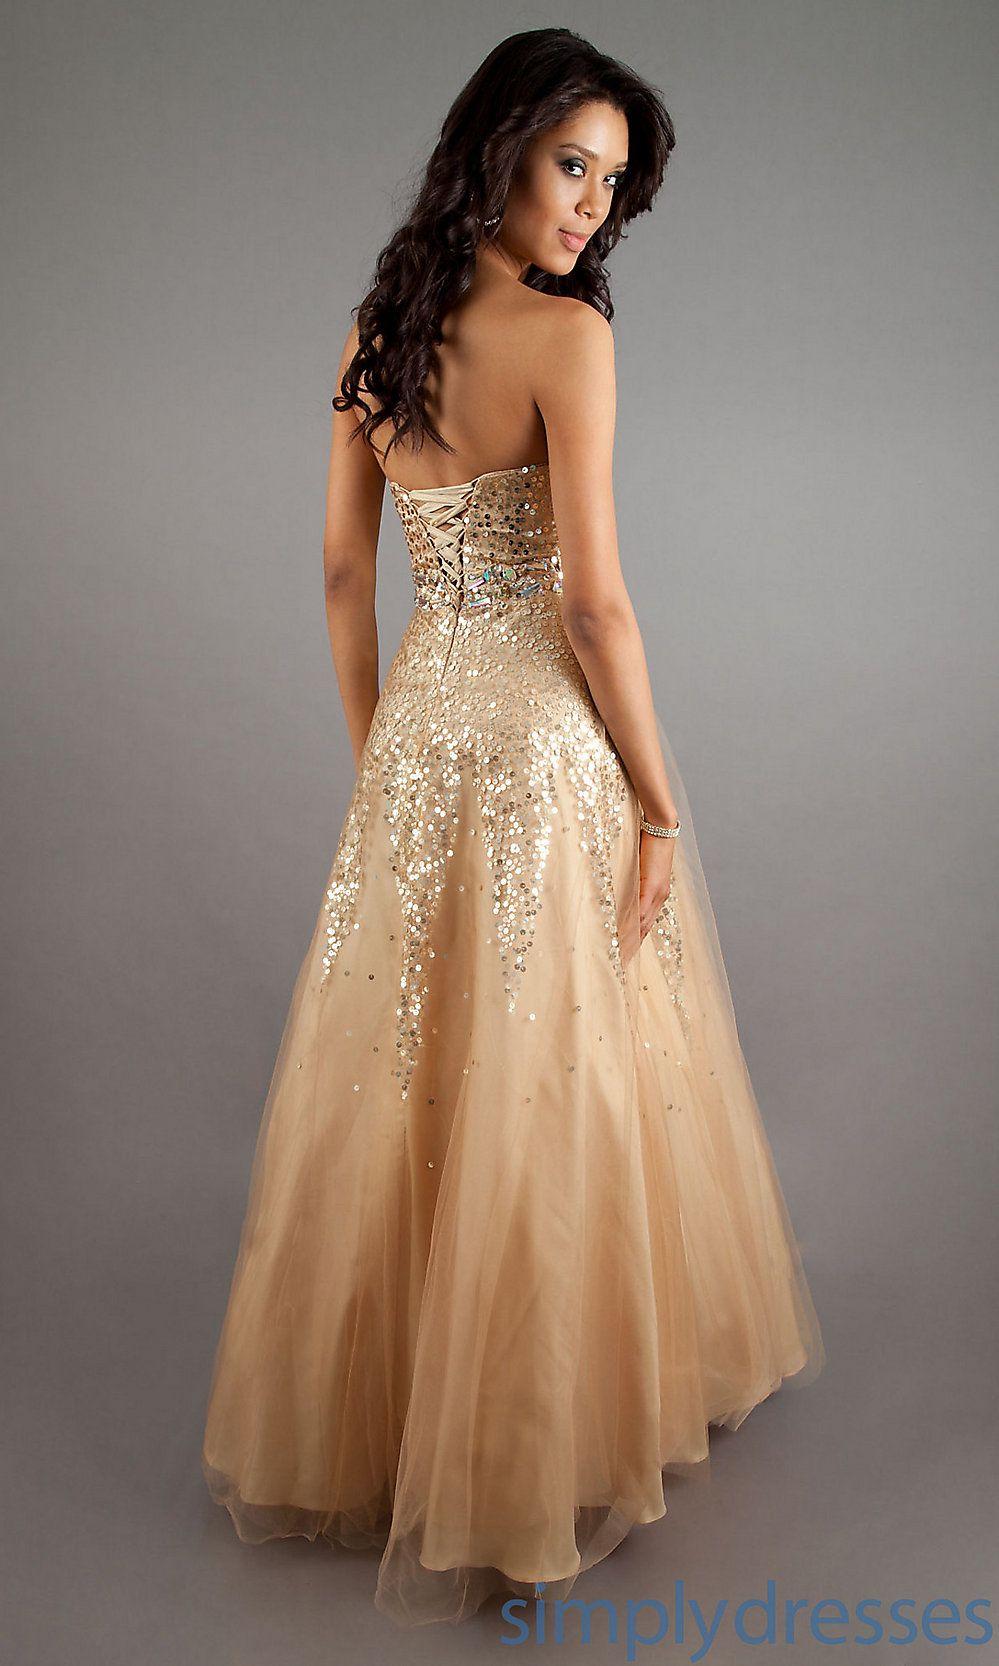 Bridesmaid Dresses In Gold | Top 250 Gold Bridesmaid Dresses | Pinterest